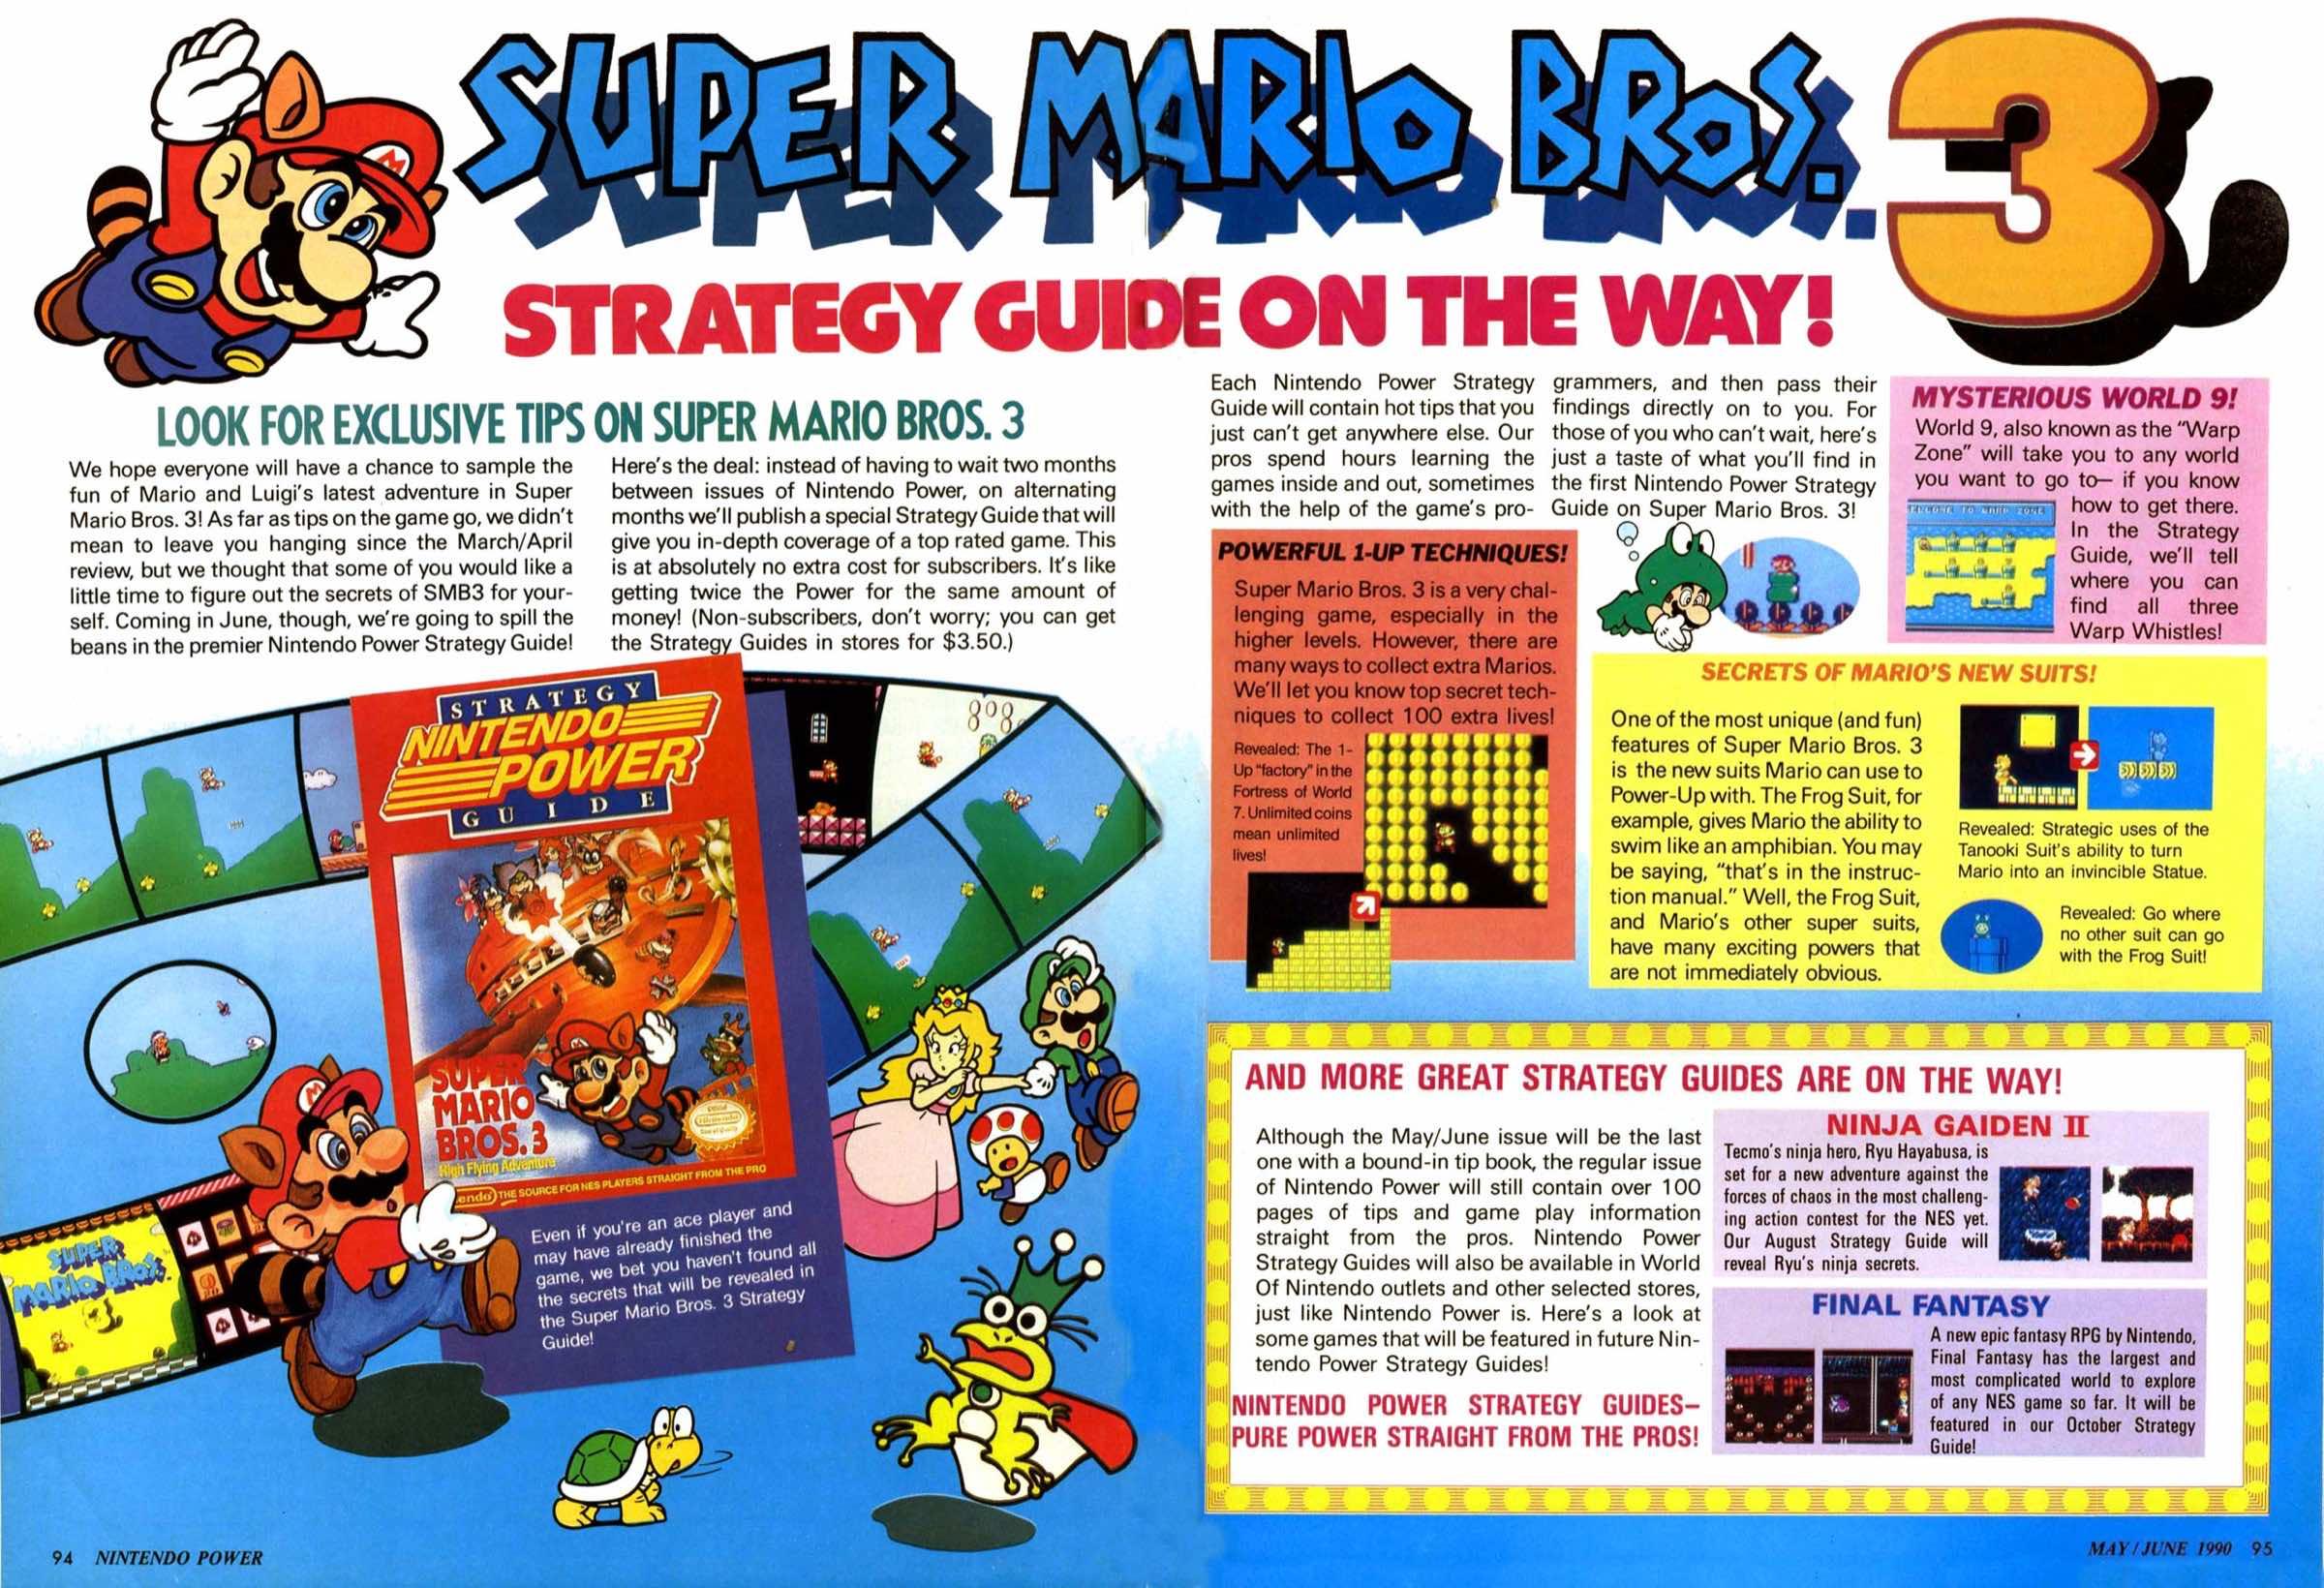 Nintendo Power   May June 1990   p094-095